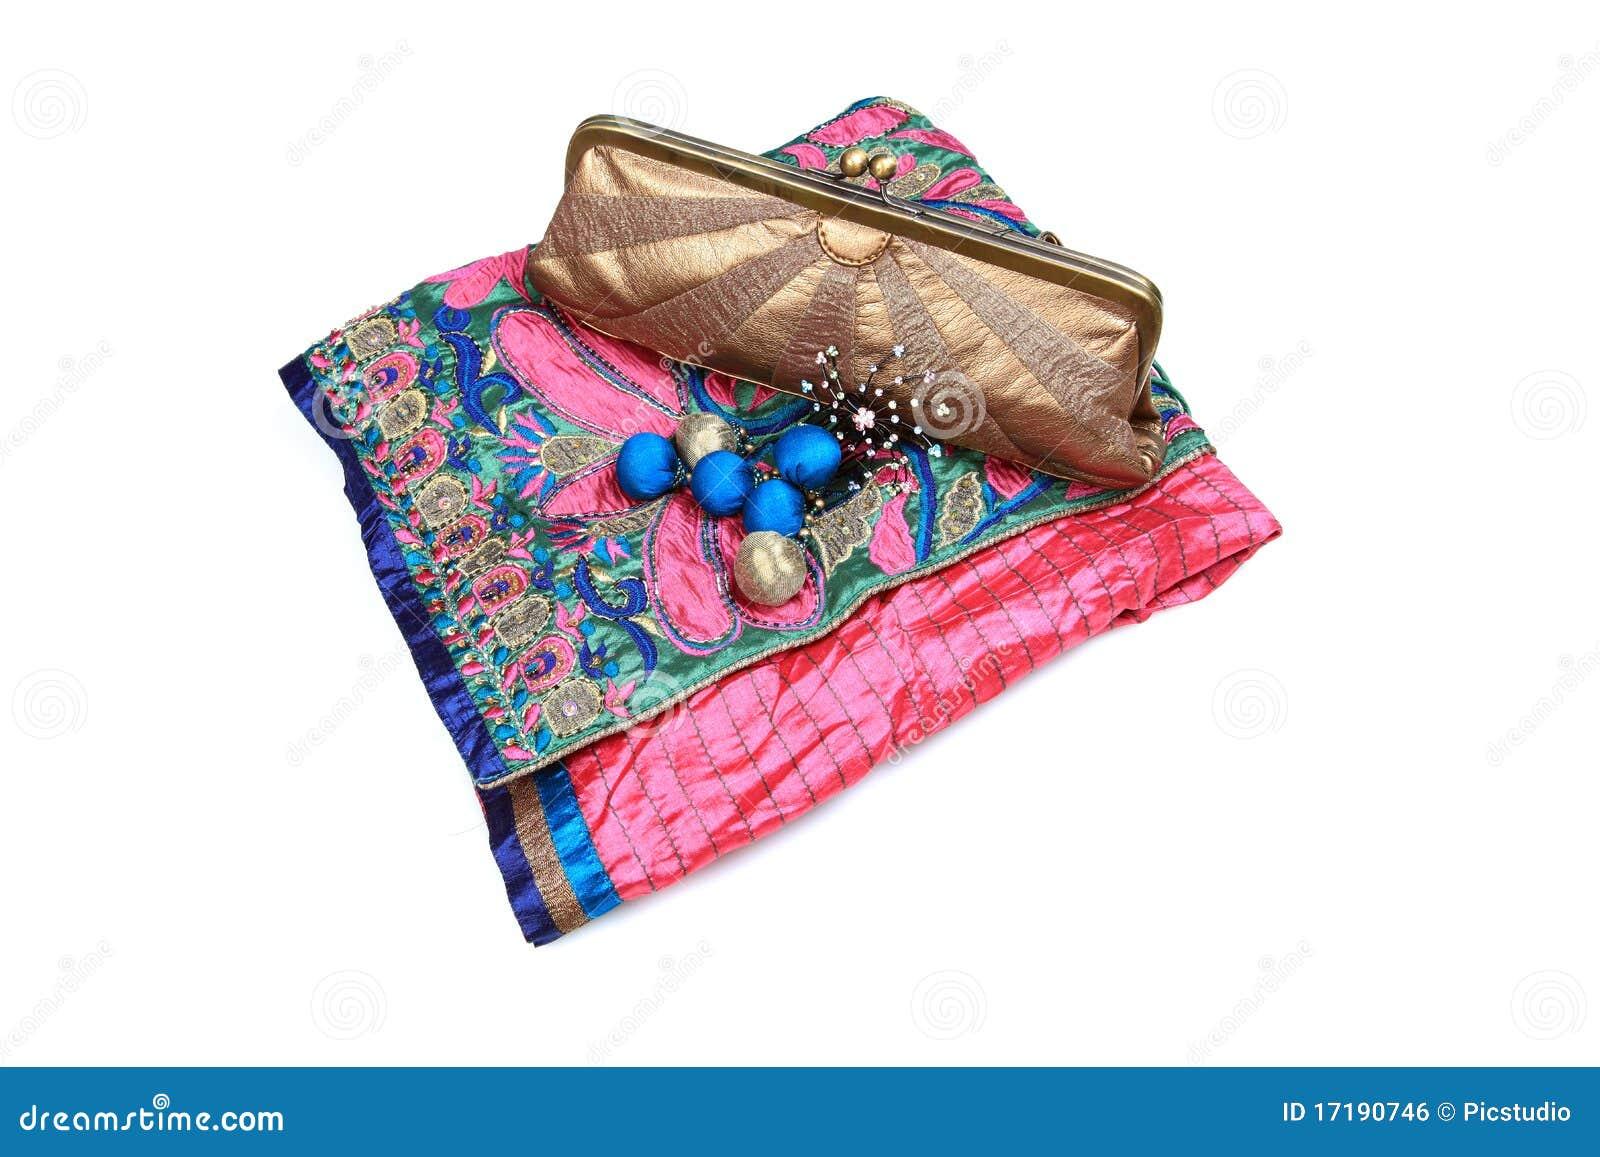 Indian wedding items